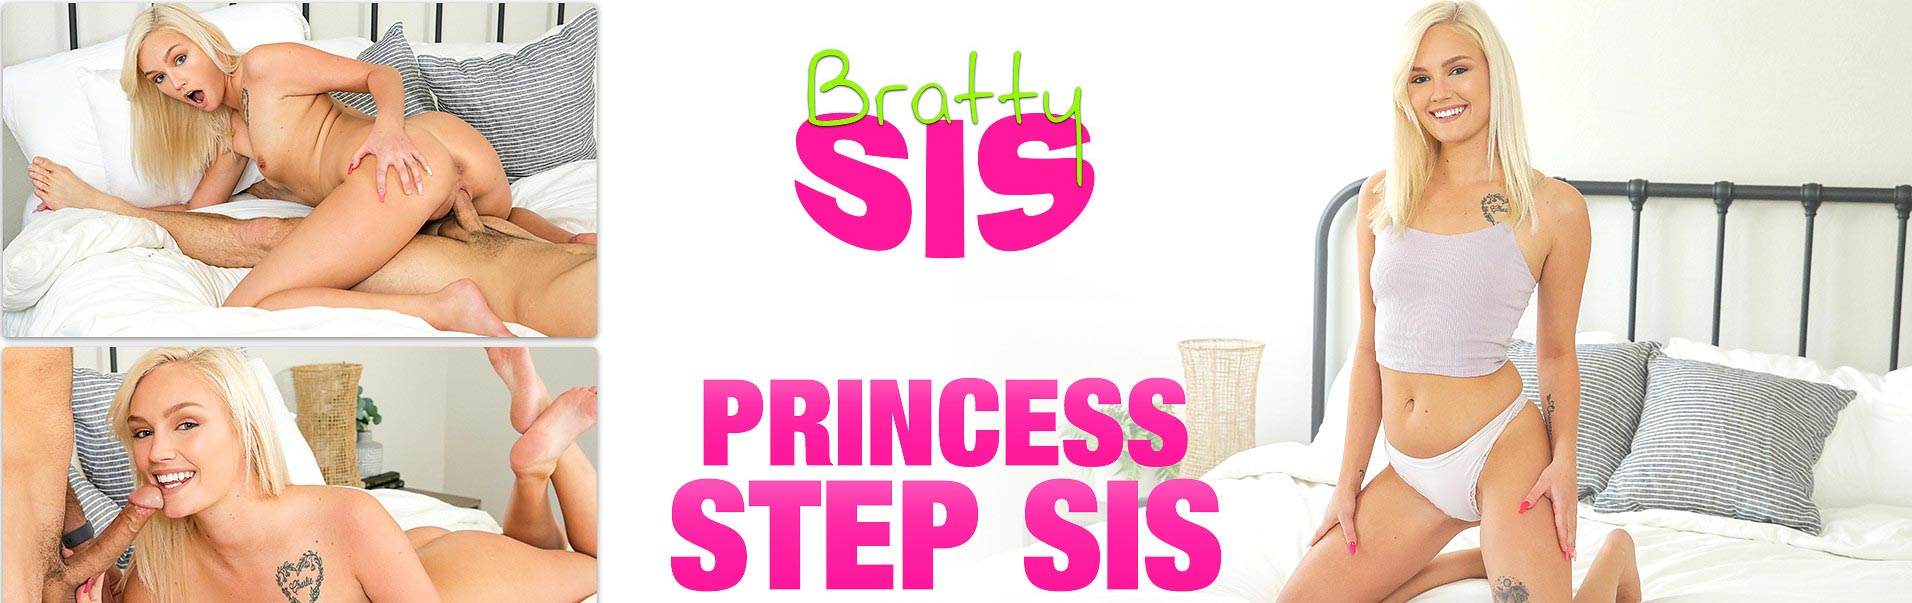 BrattySis.com Slider - Princess Step Sis - Winter Bell